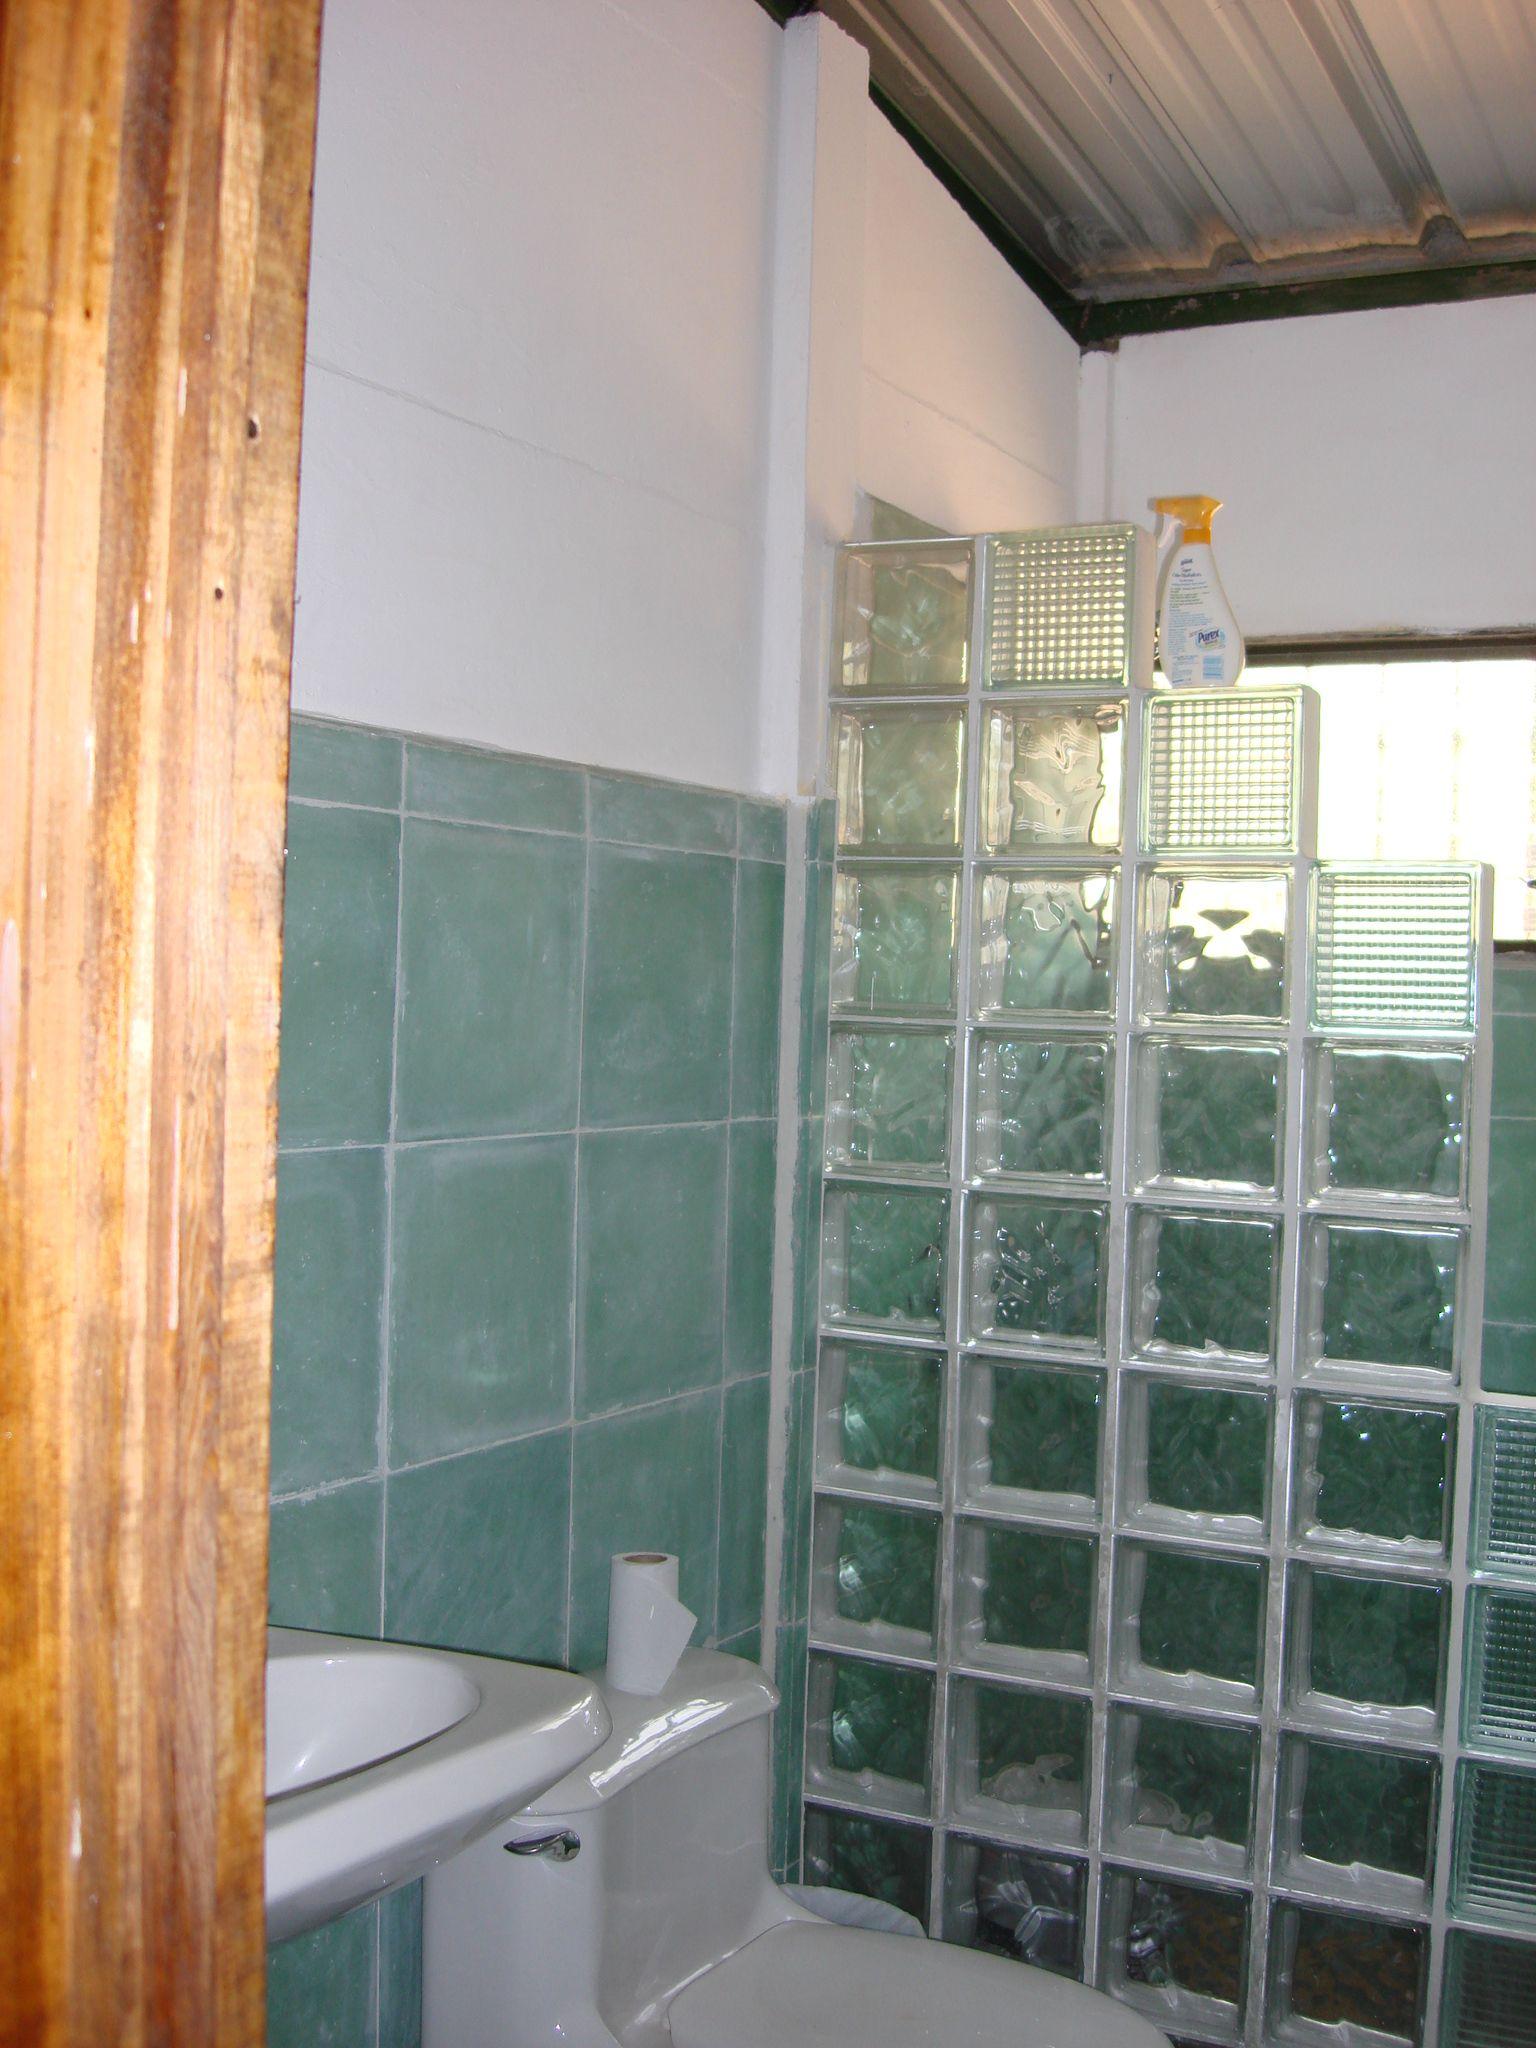 Bloques de vidrio en ducha ba os en casas prefabricadas for Bano de pared de concreto encerado